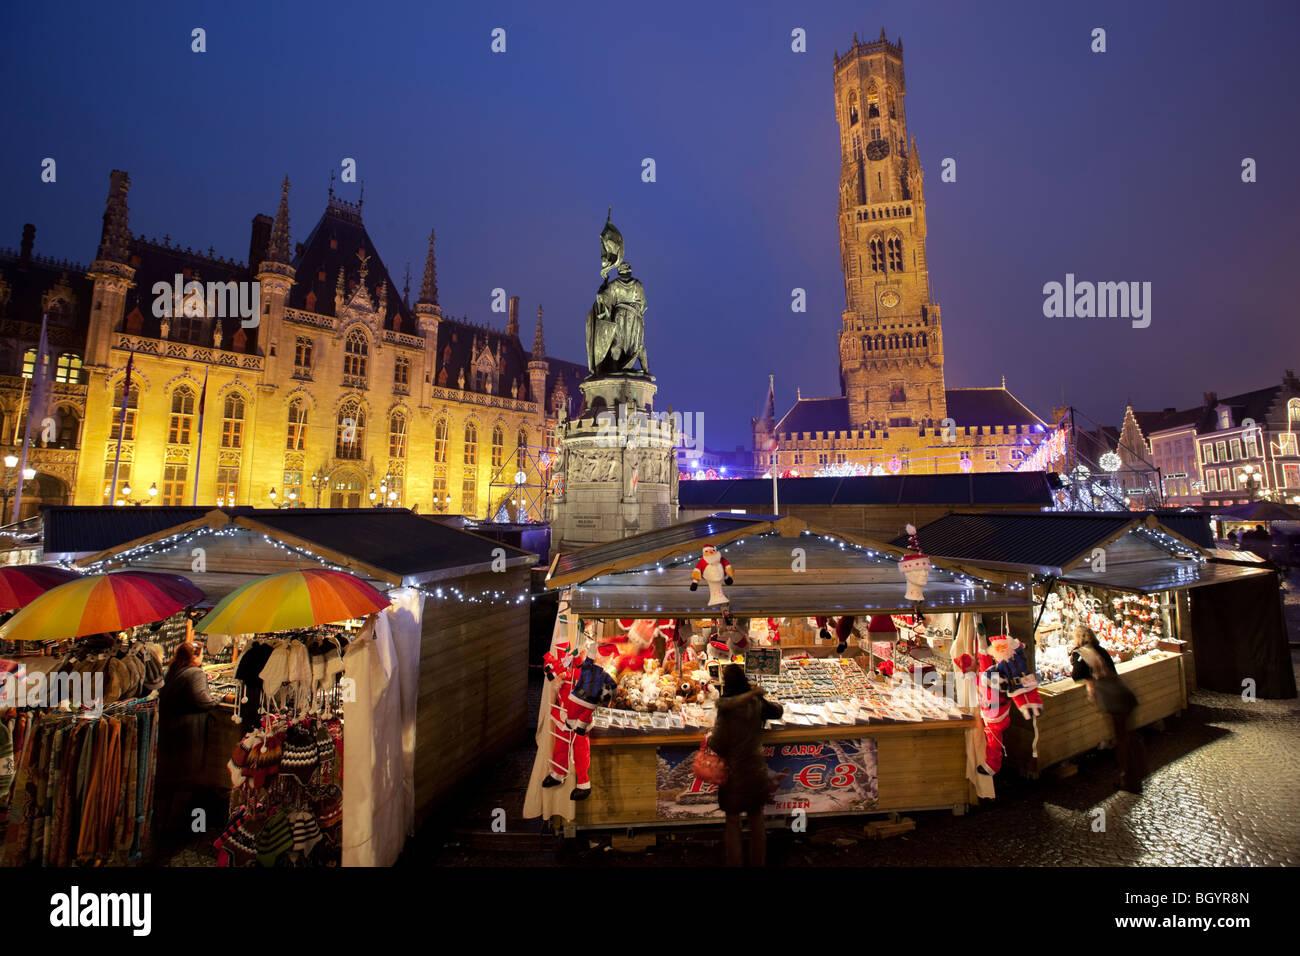 Bruges Christmas Market 2019.Bruges Christmas Market Stock Photos Bruges Christmas